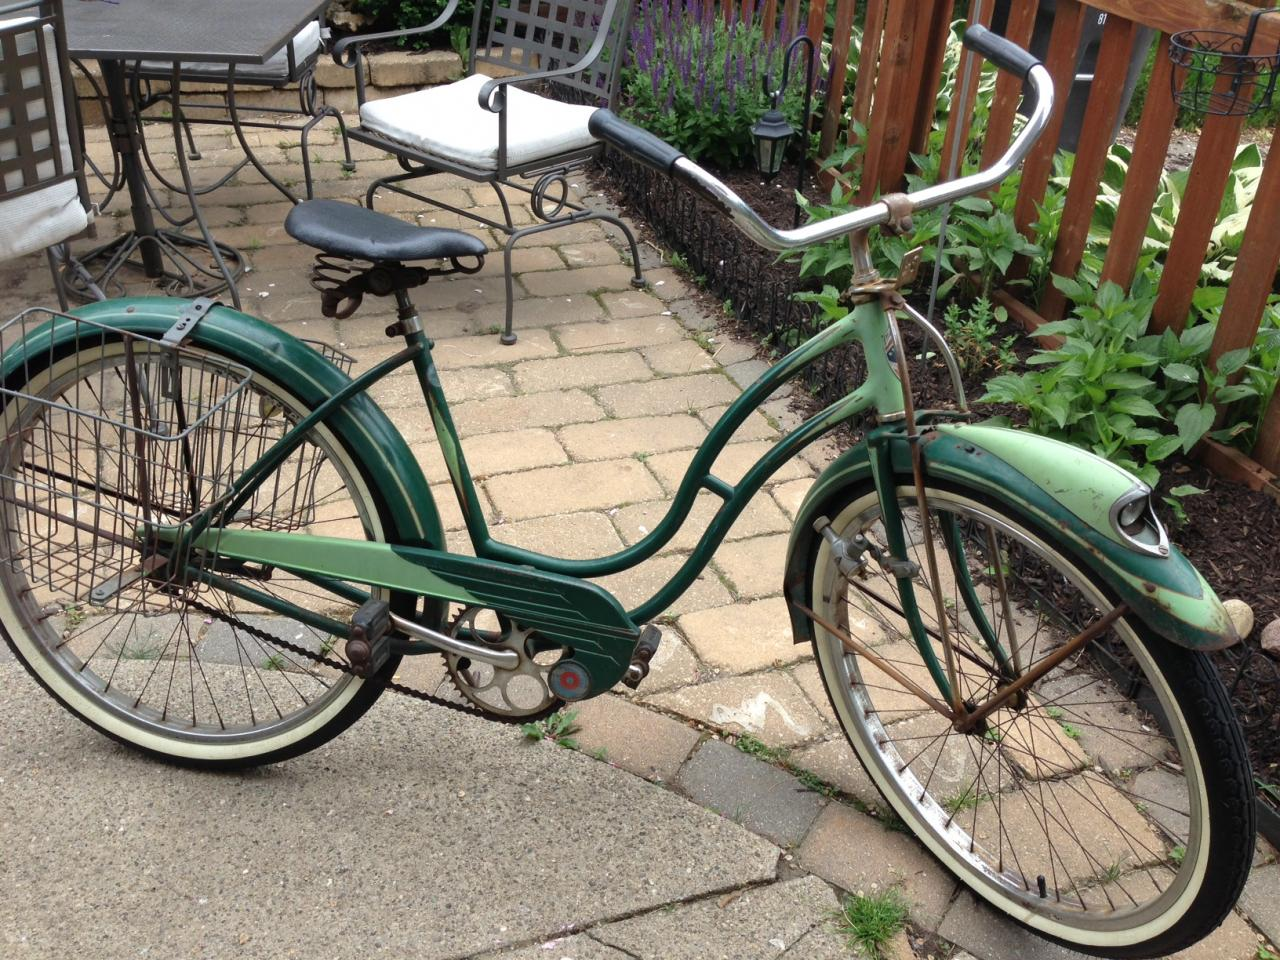 4db5c46dac1 1951 BF Goodrich Schwinn | The Classic and Antique Bicycle Exchange